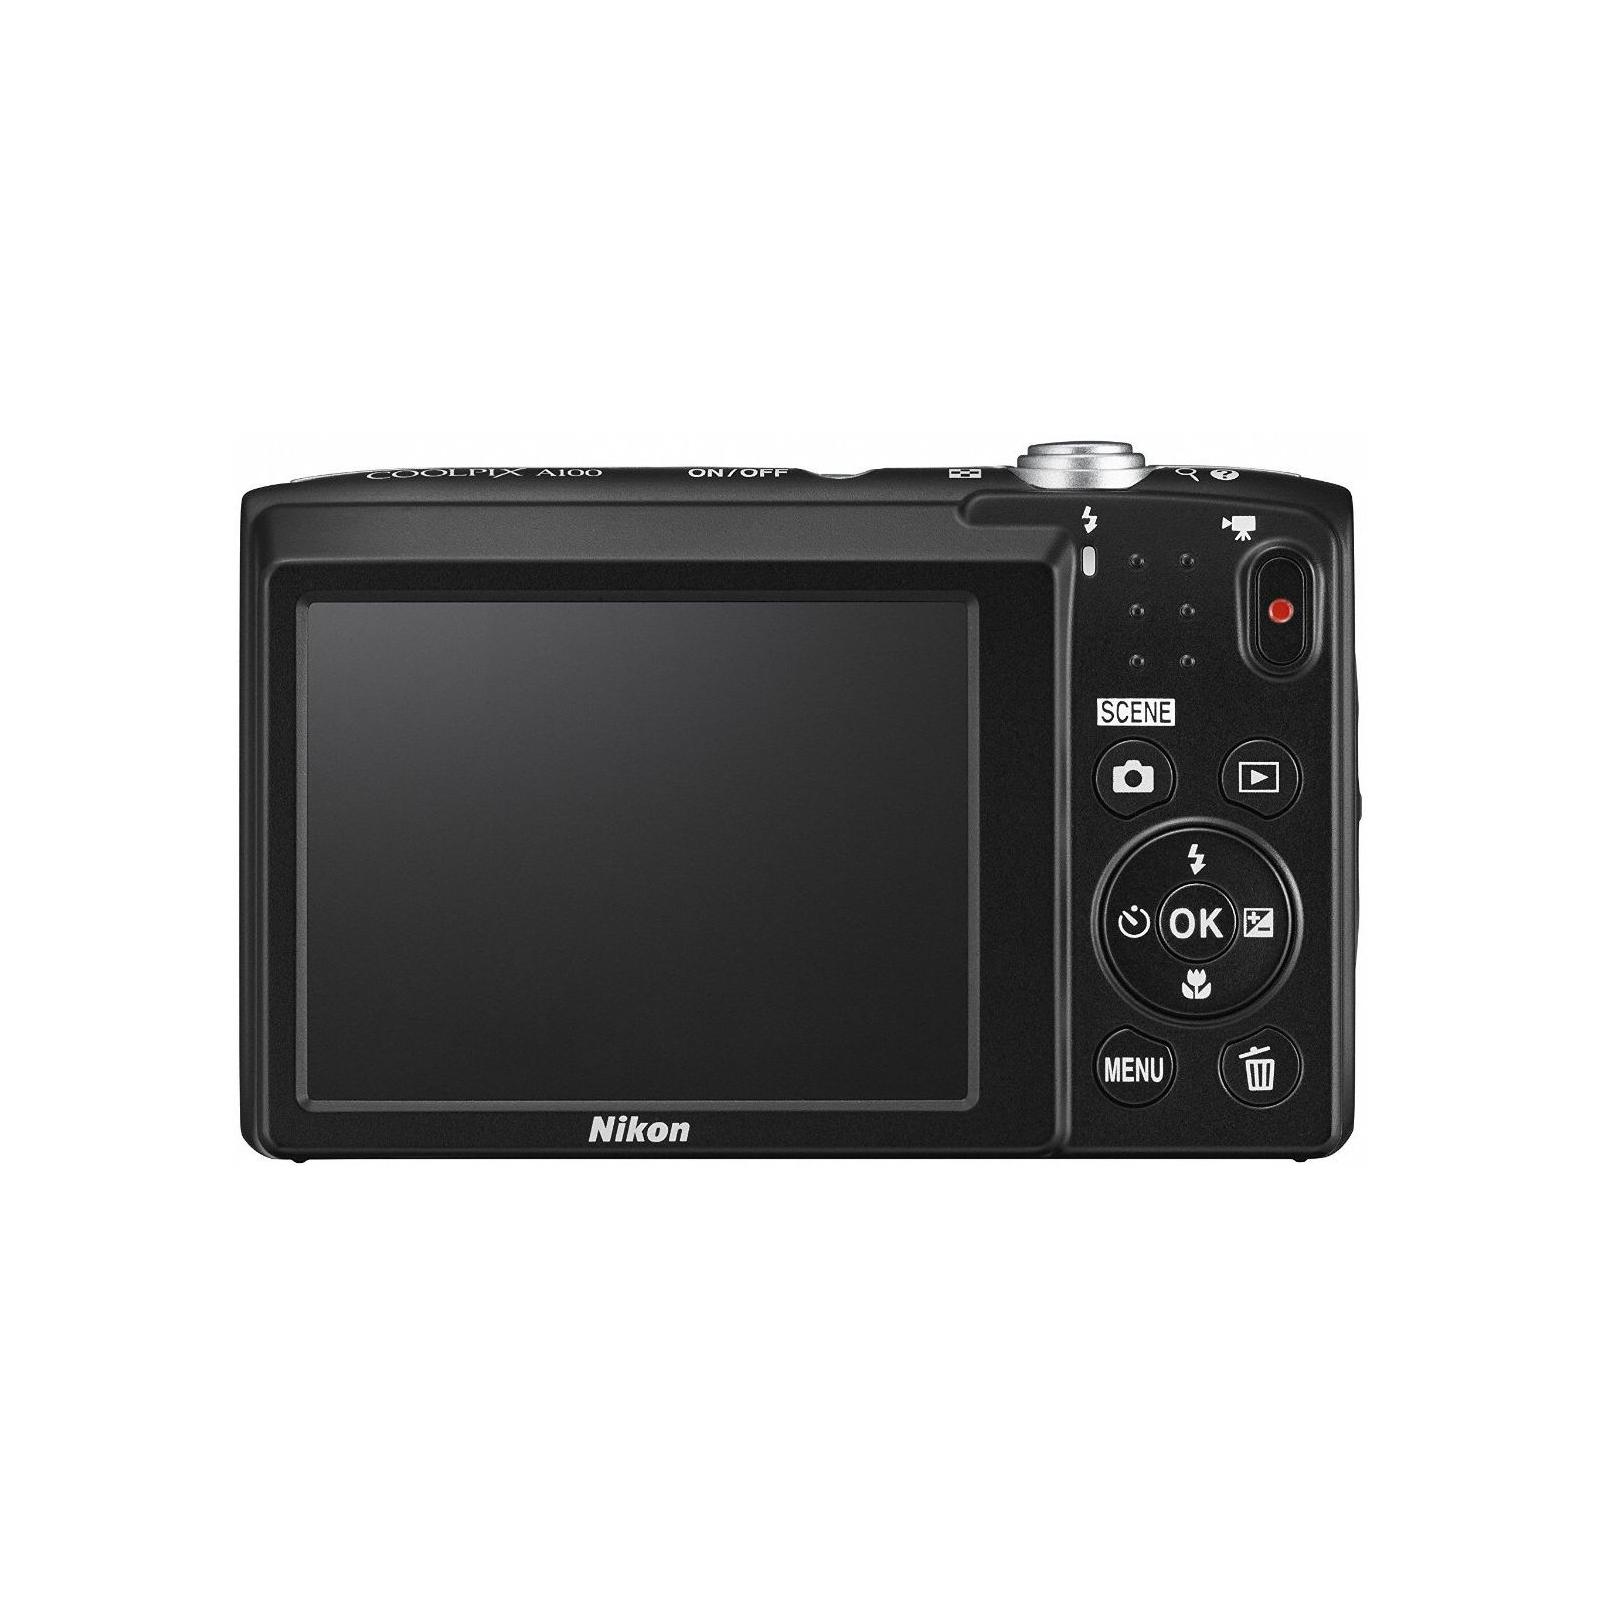 Цифровой фотоаппарат Nikon Coolpix A100 Purple (VNA973E1) изображение 4